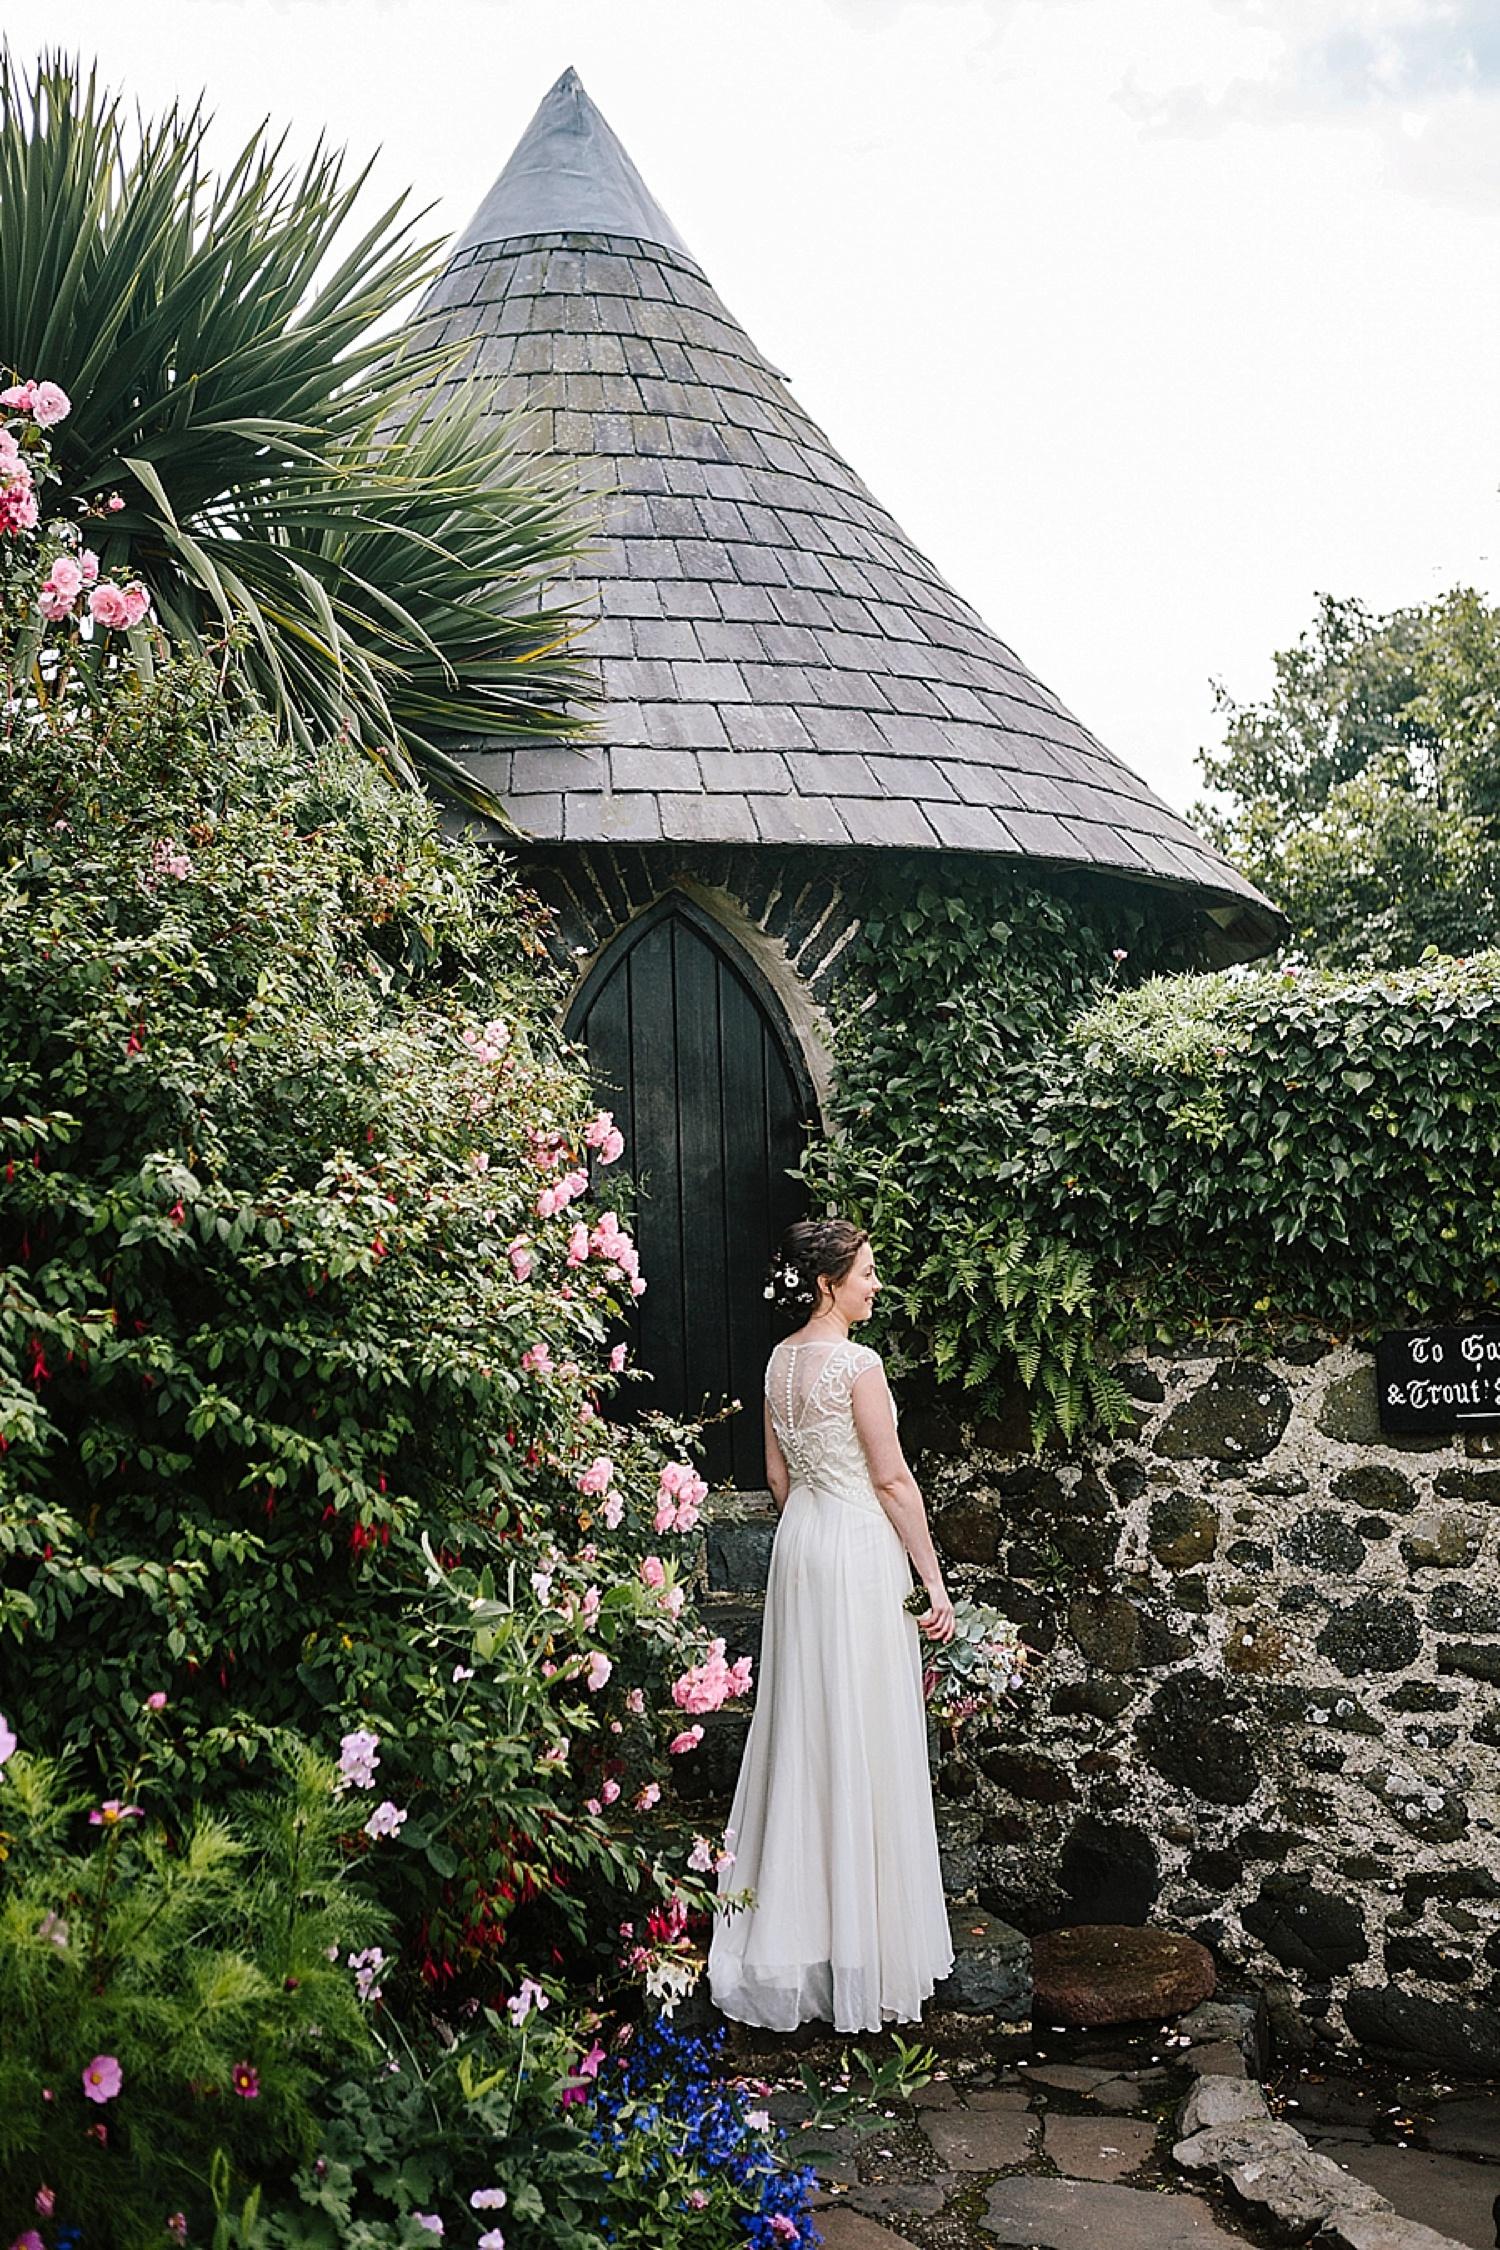 bridal portrait, bride among flowers, bride in walled garden